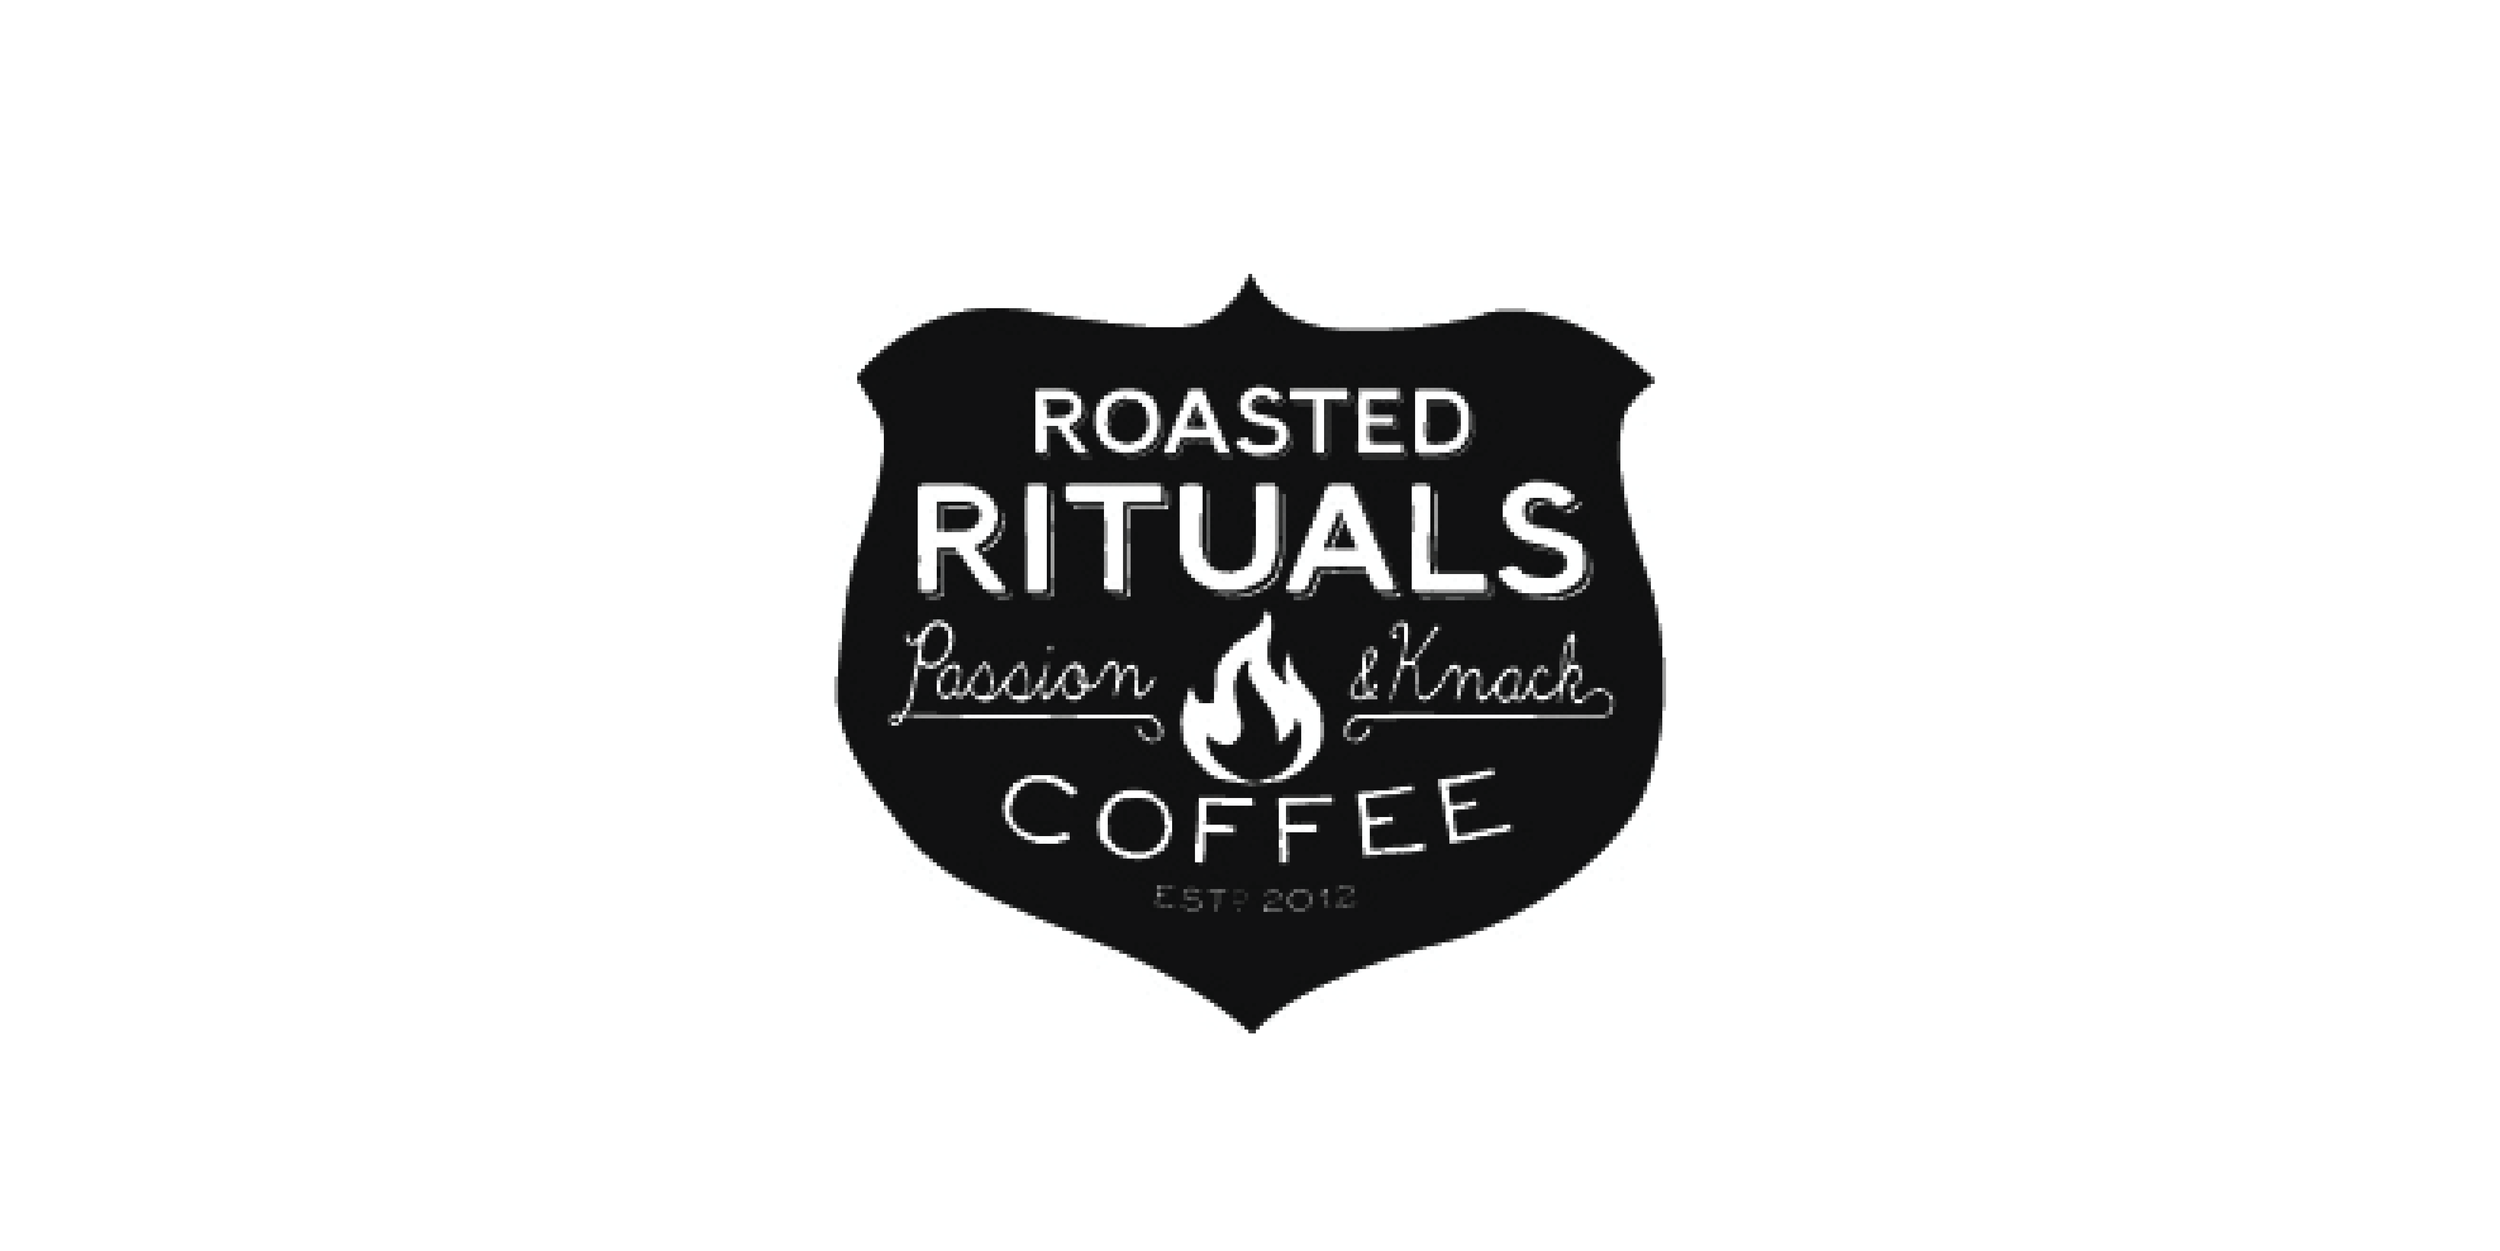 Roasted Rituals